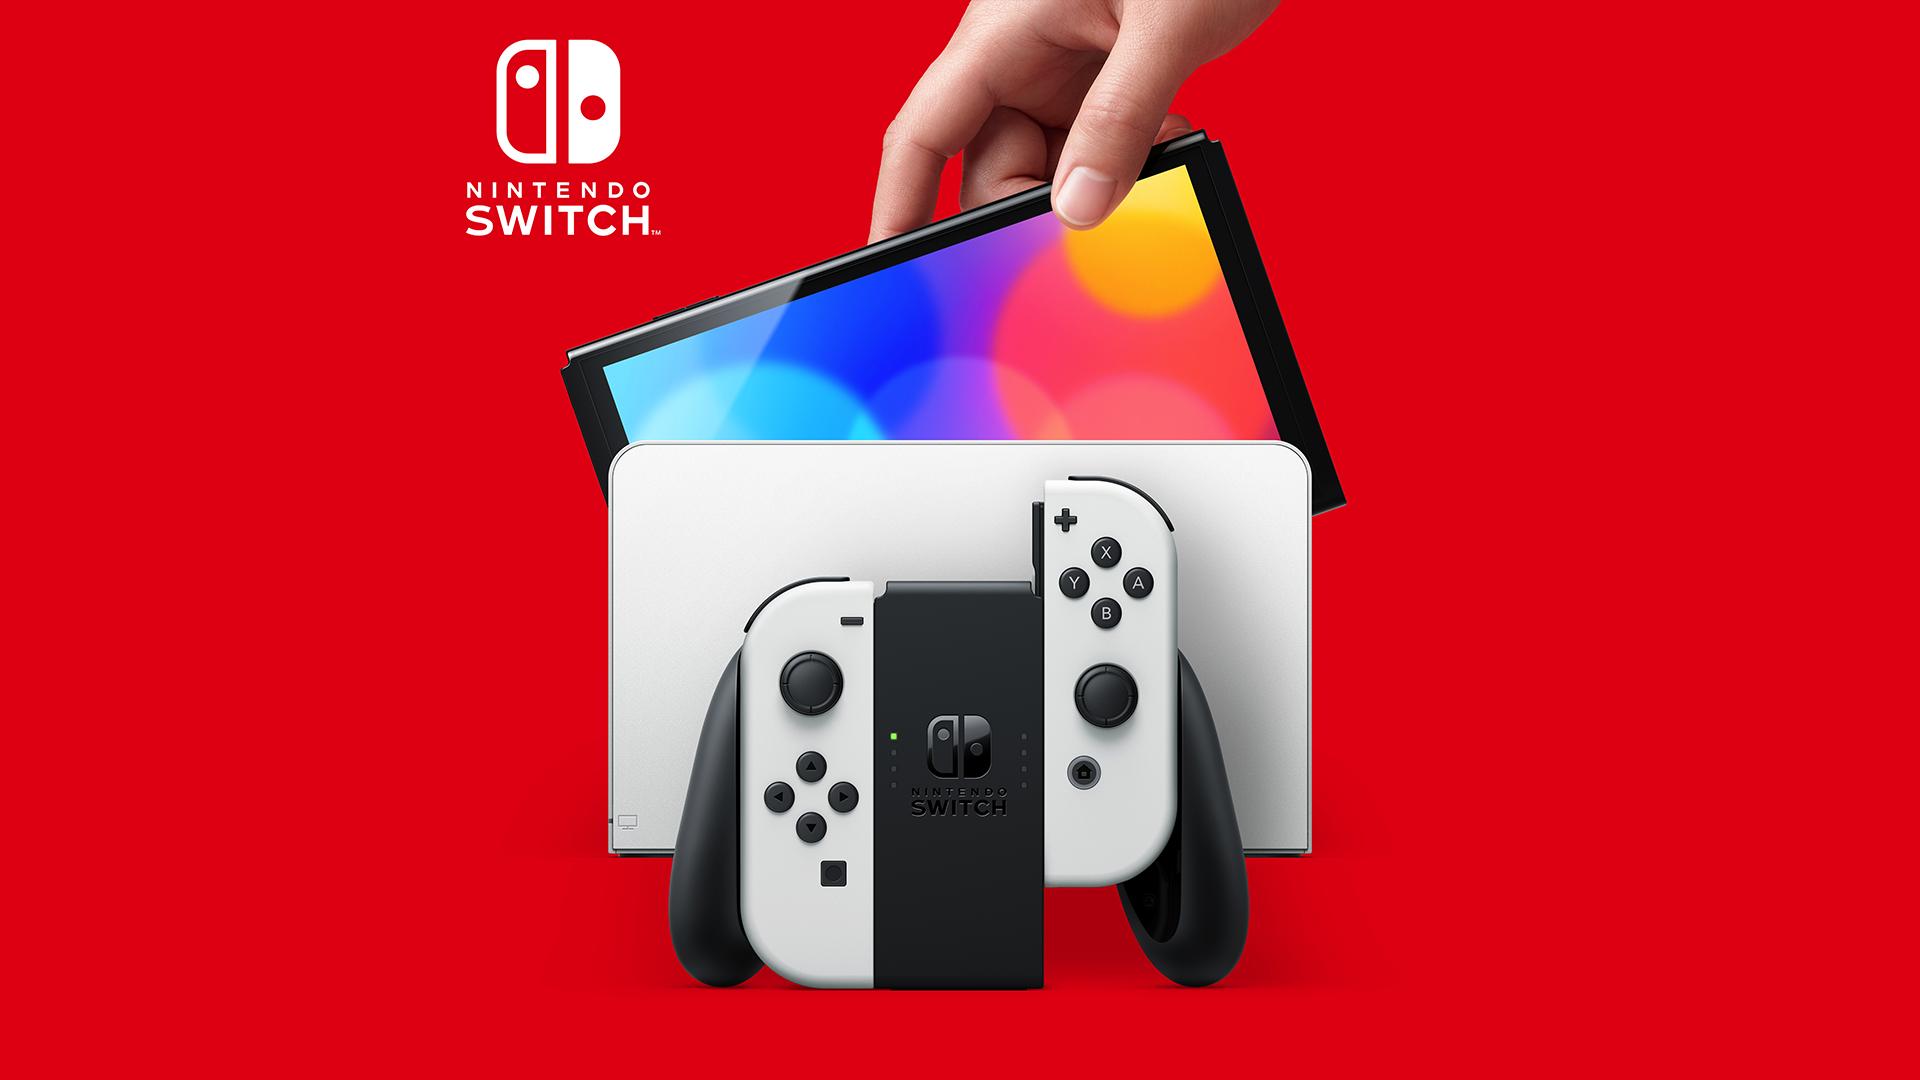 The Nintendo Switch OLED Model